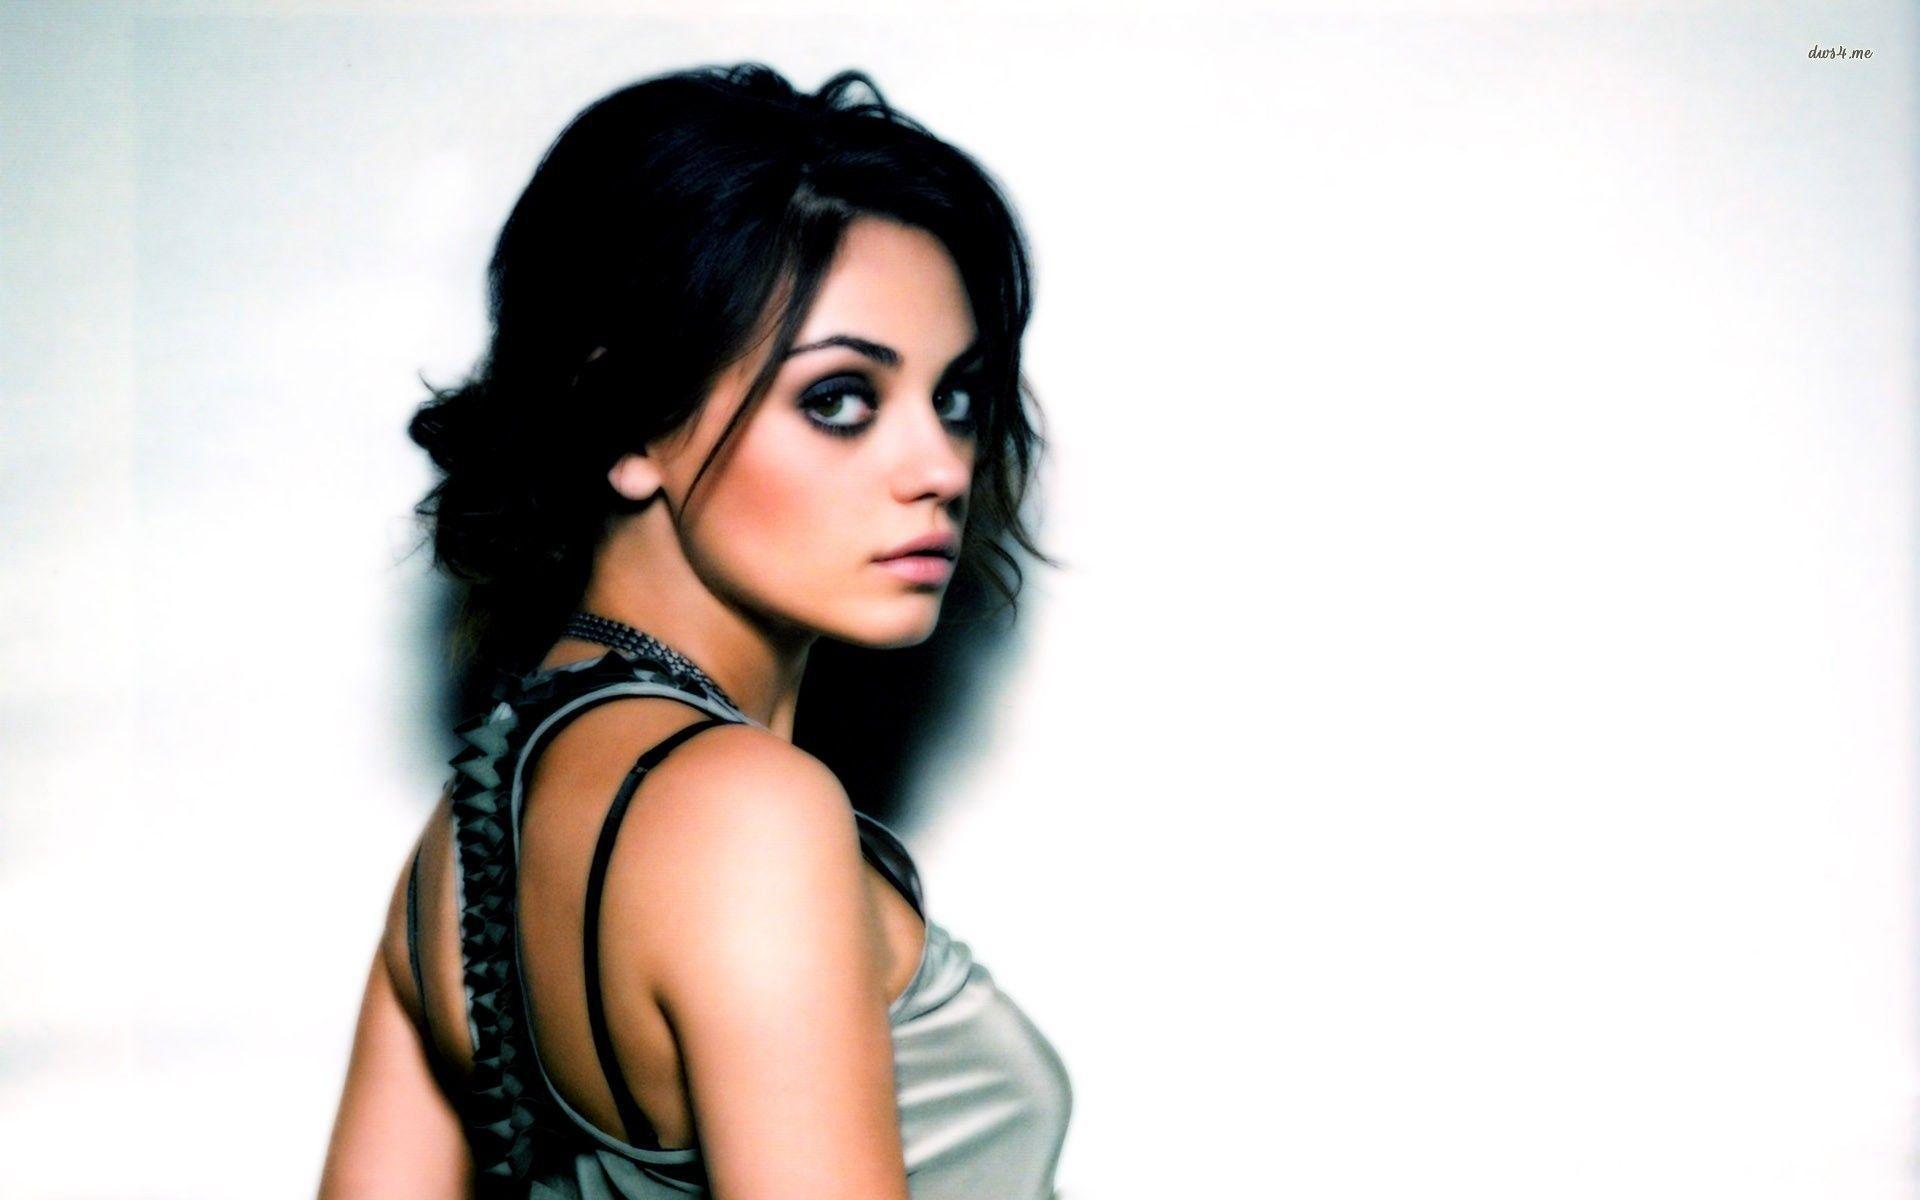 Mila Kunis Wallpaper 35 Backgrounds | Wallruru.com